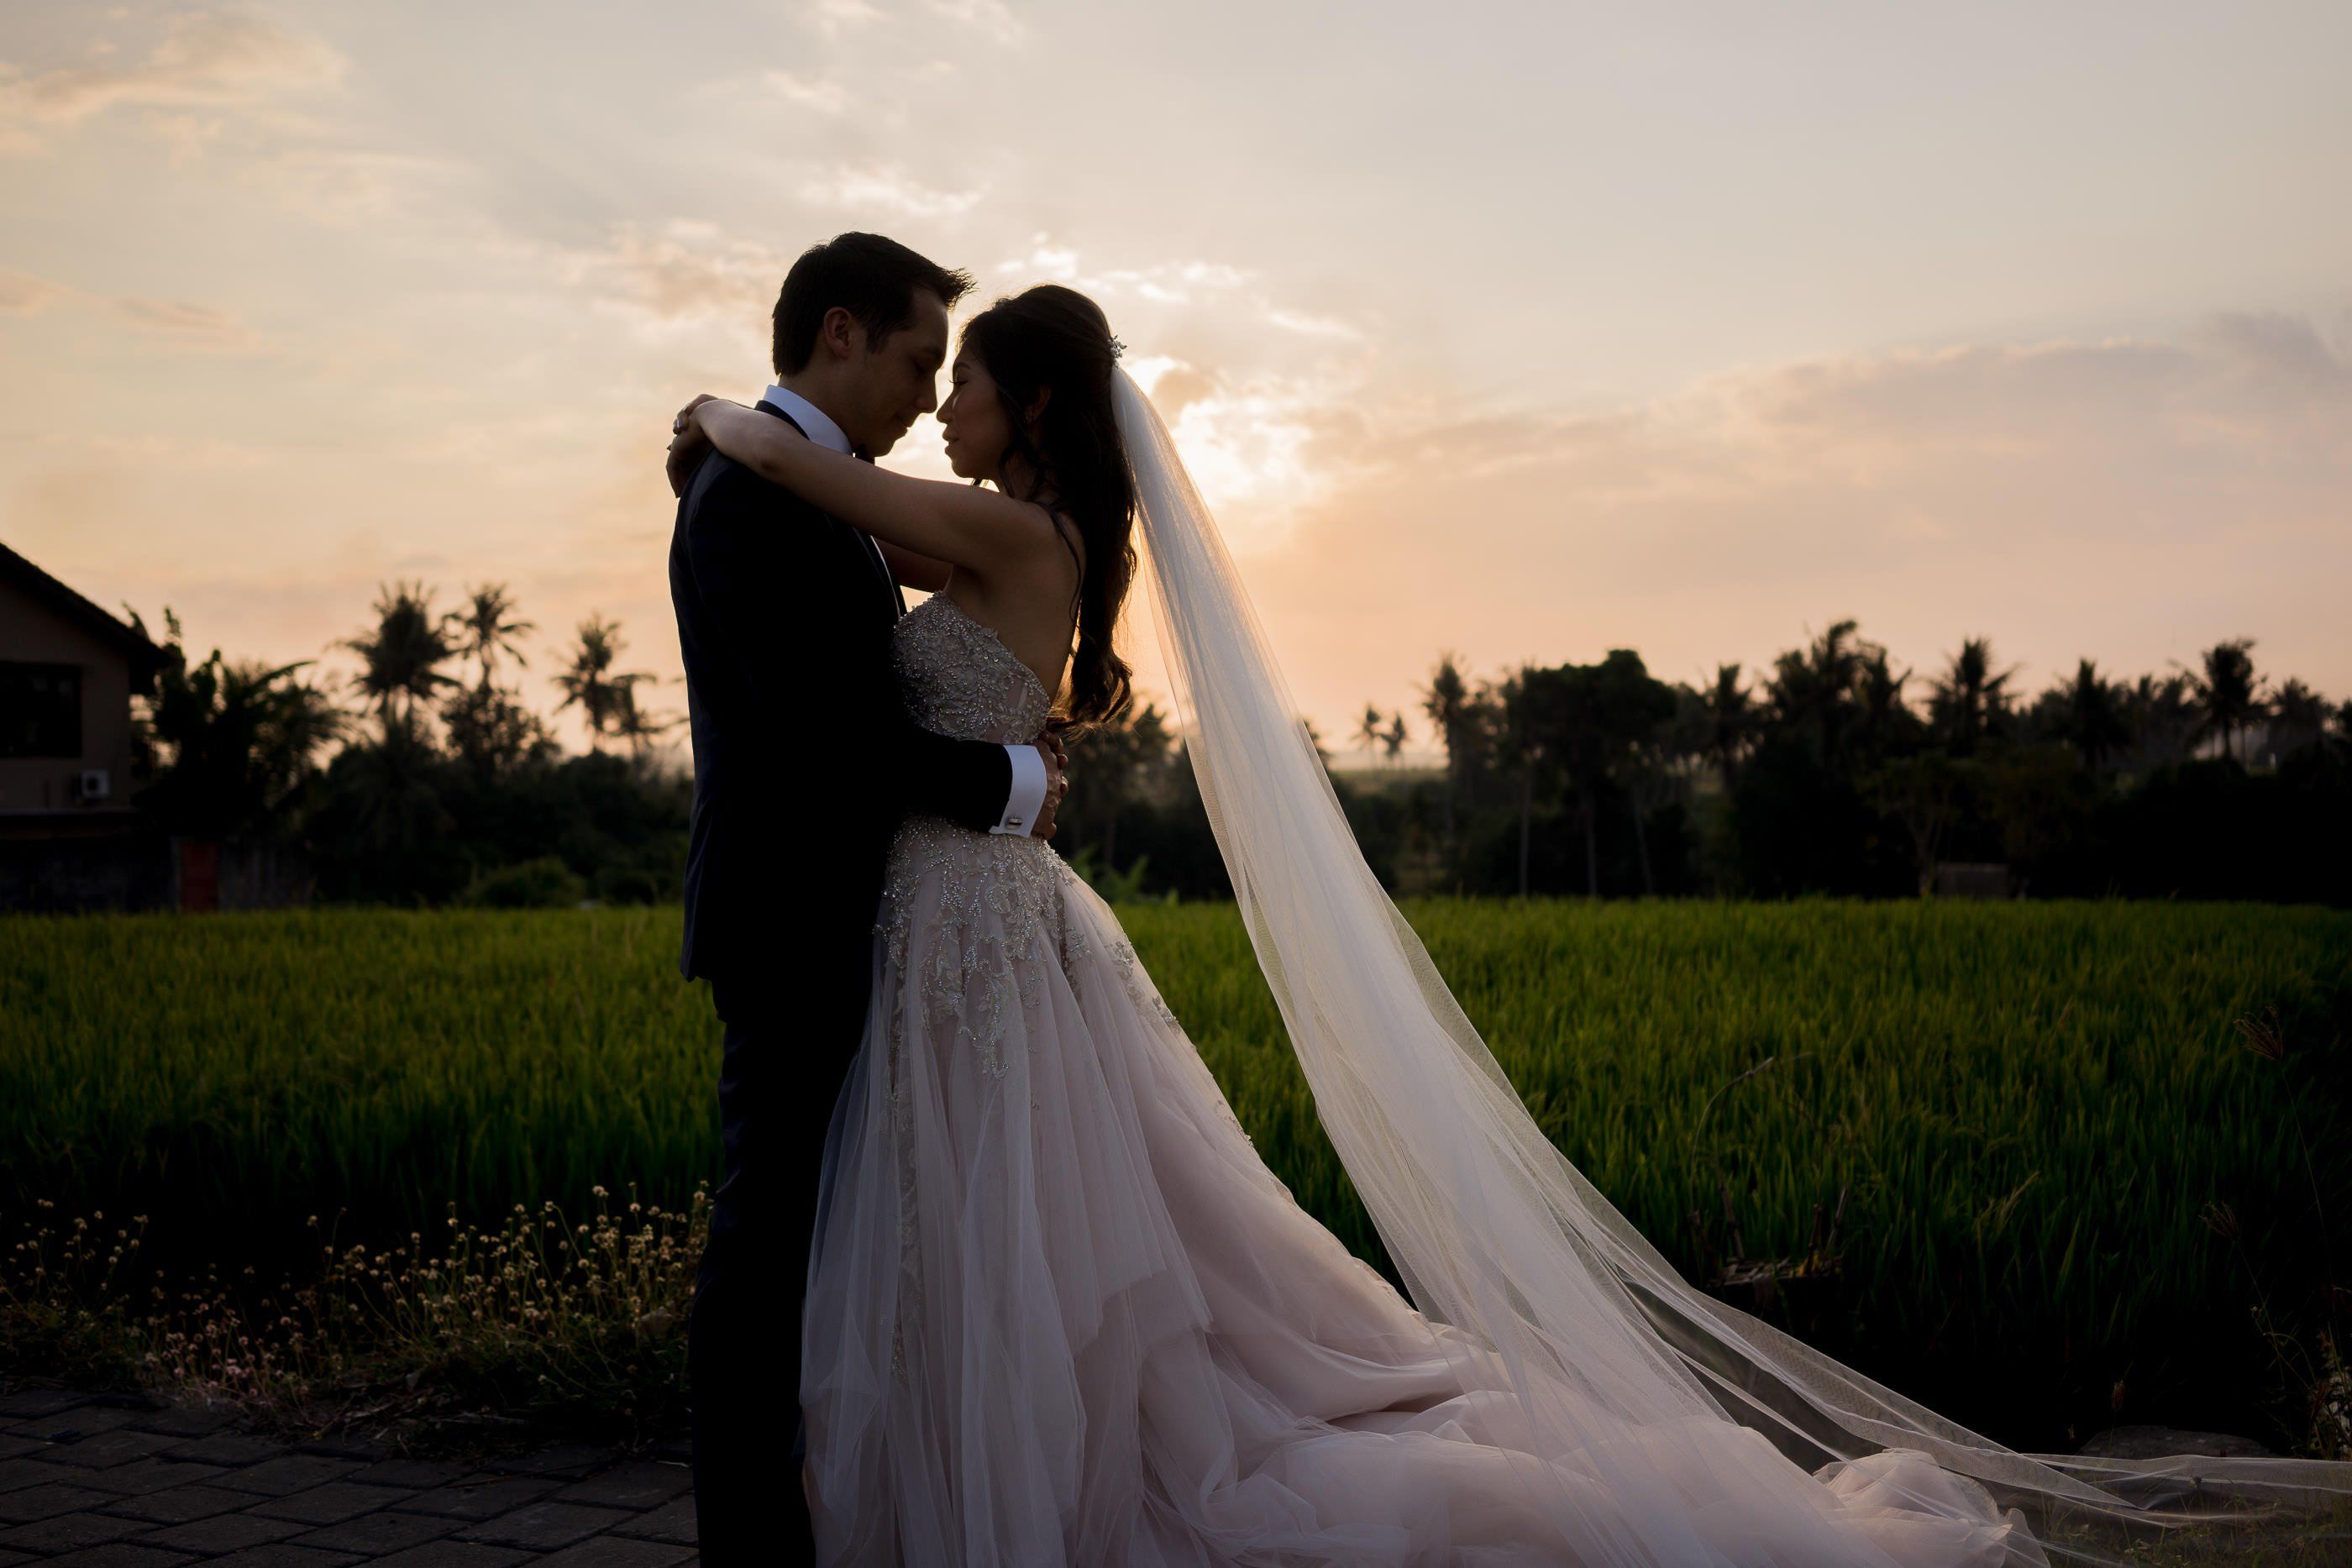 destination wedding photography ideas